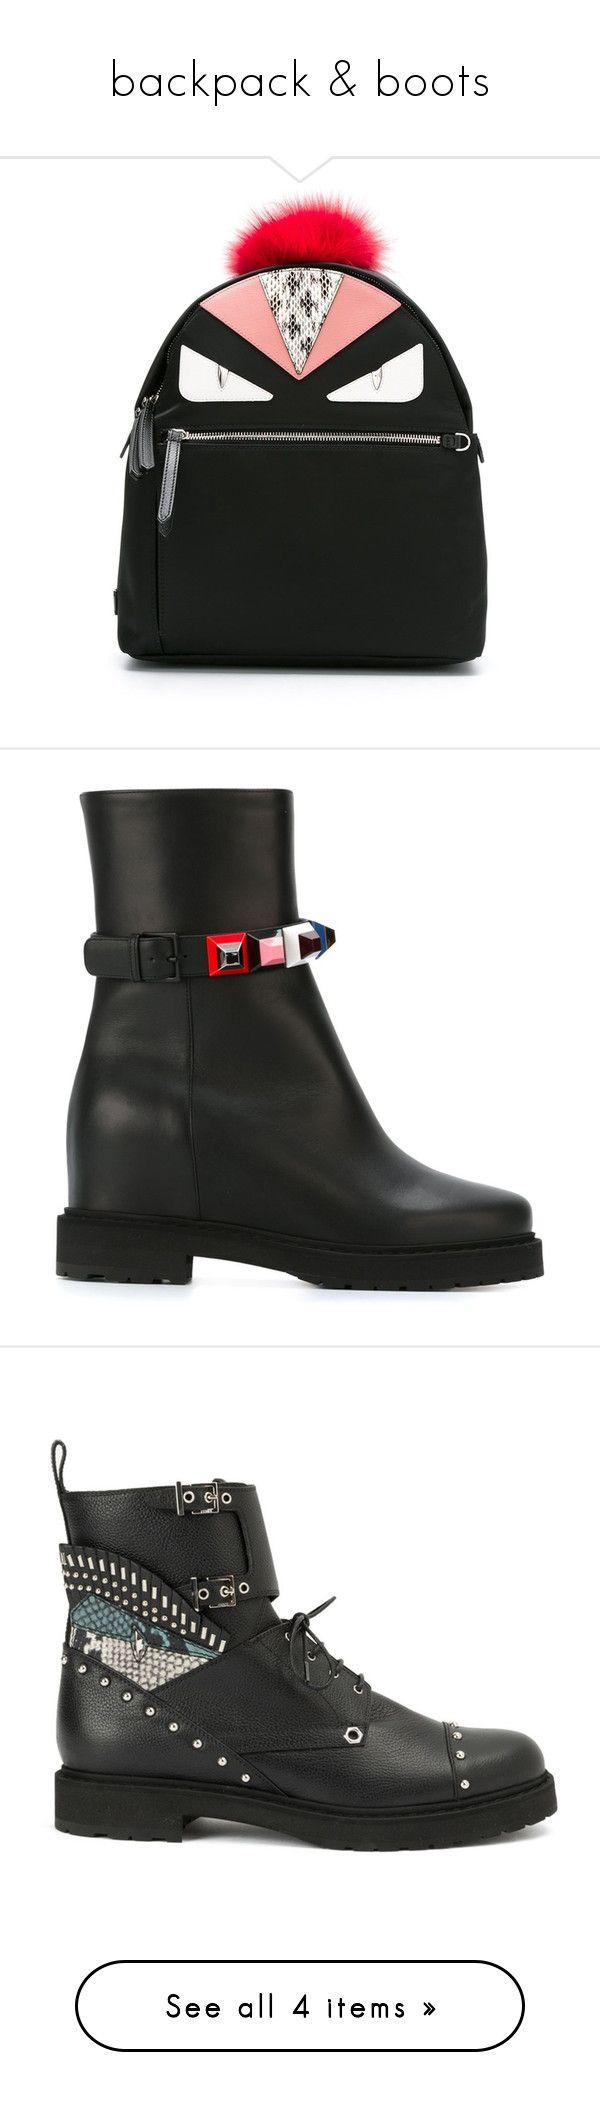 """backpack & boots"" by jofrebcn ❤ liked on Polyvore featuring bags, handbags, black, fendi purses, fendi handbags, fendi, fendi bags, shoes, boots and ankle booties"